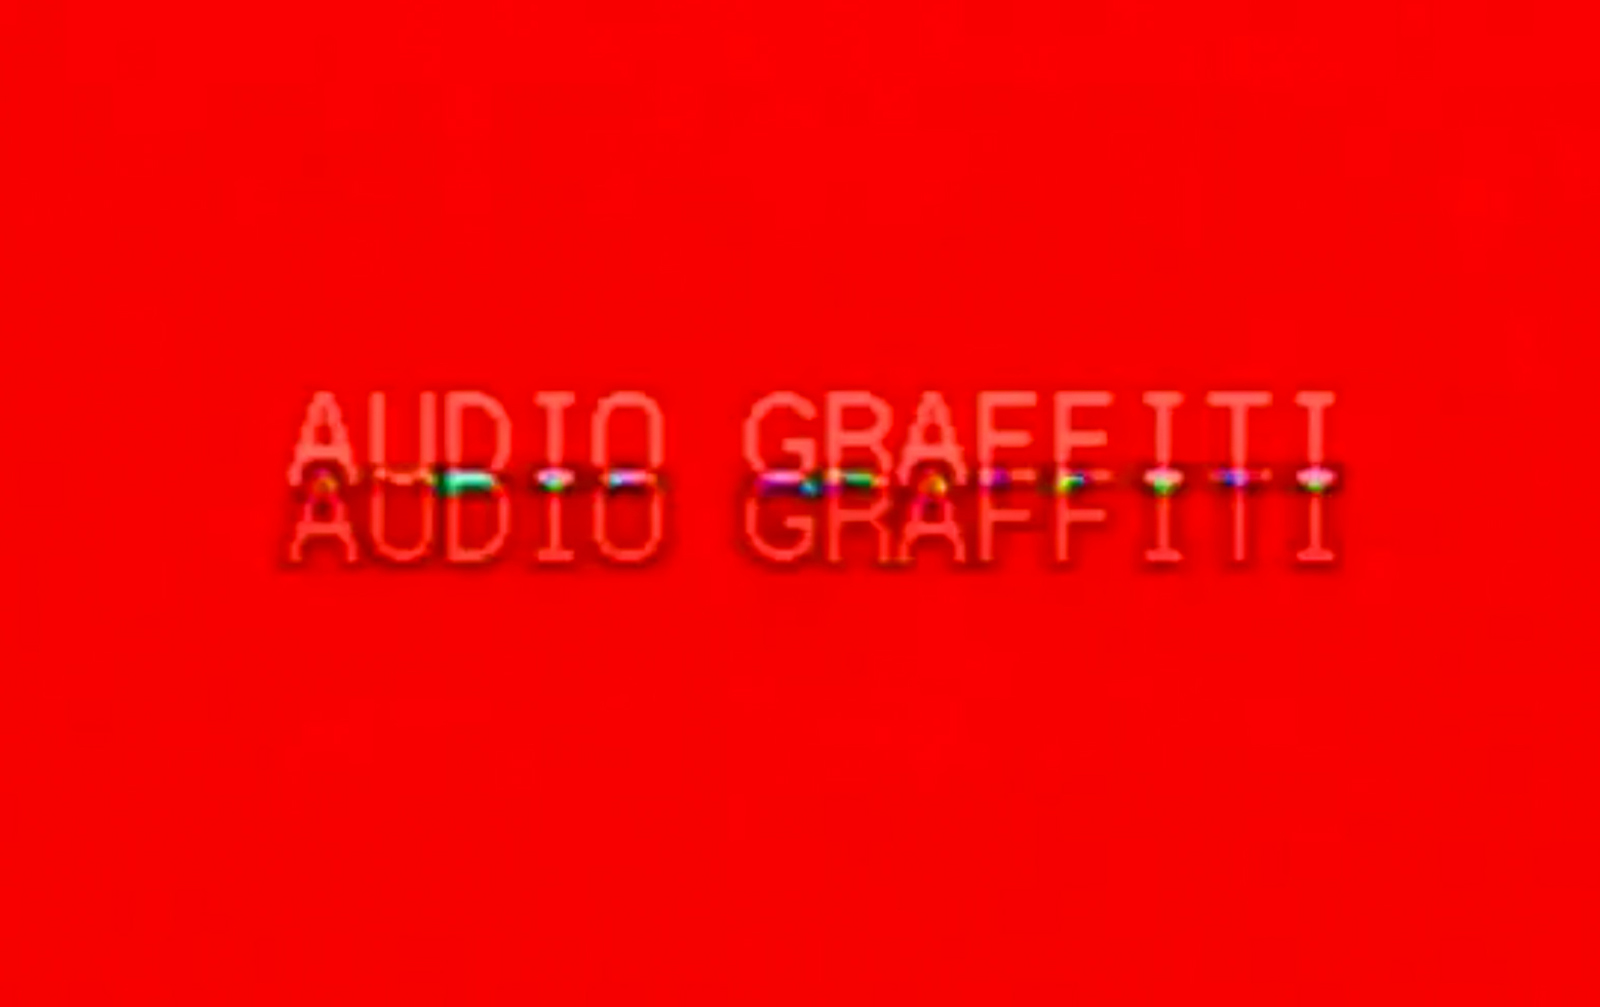 Audio Graffiti